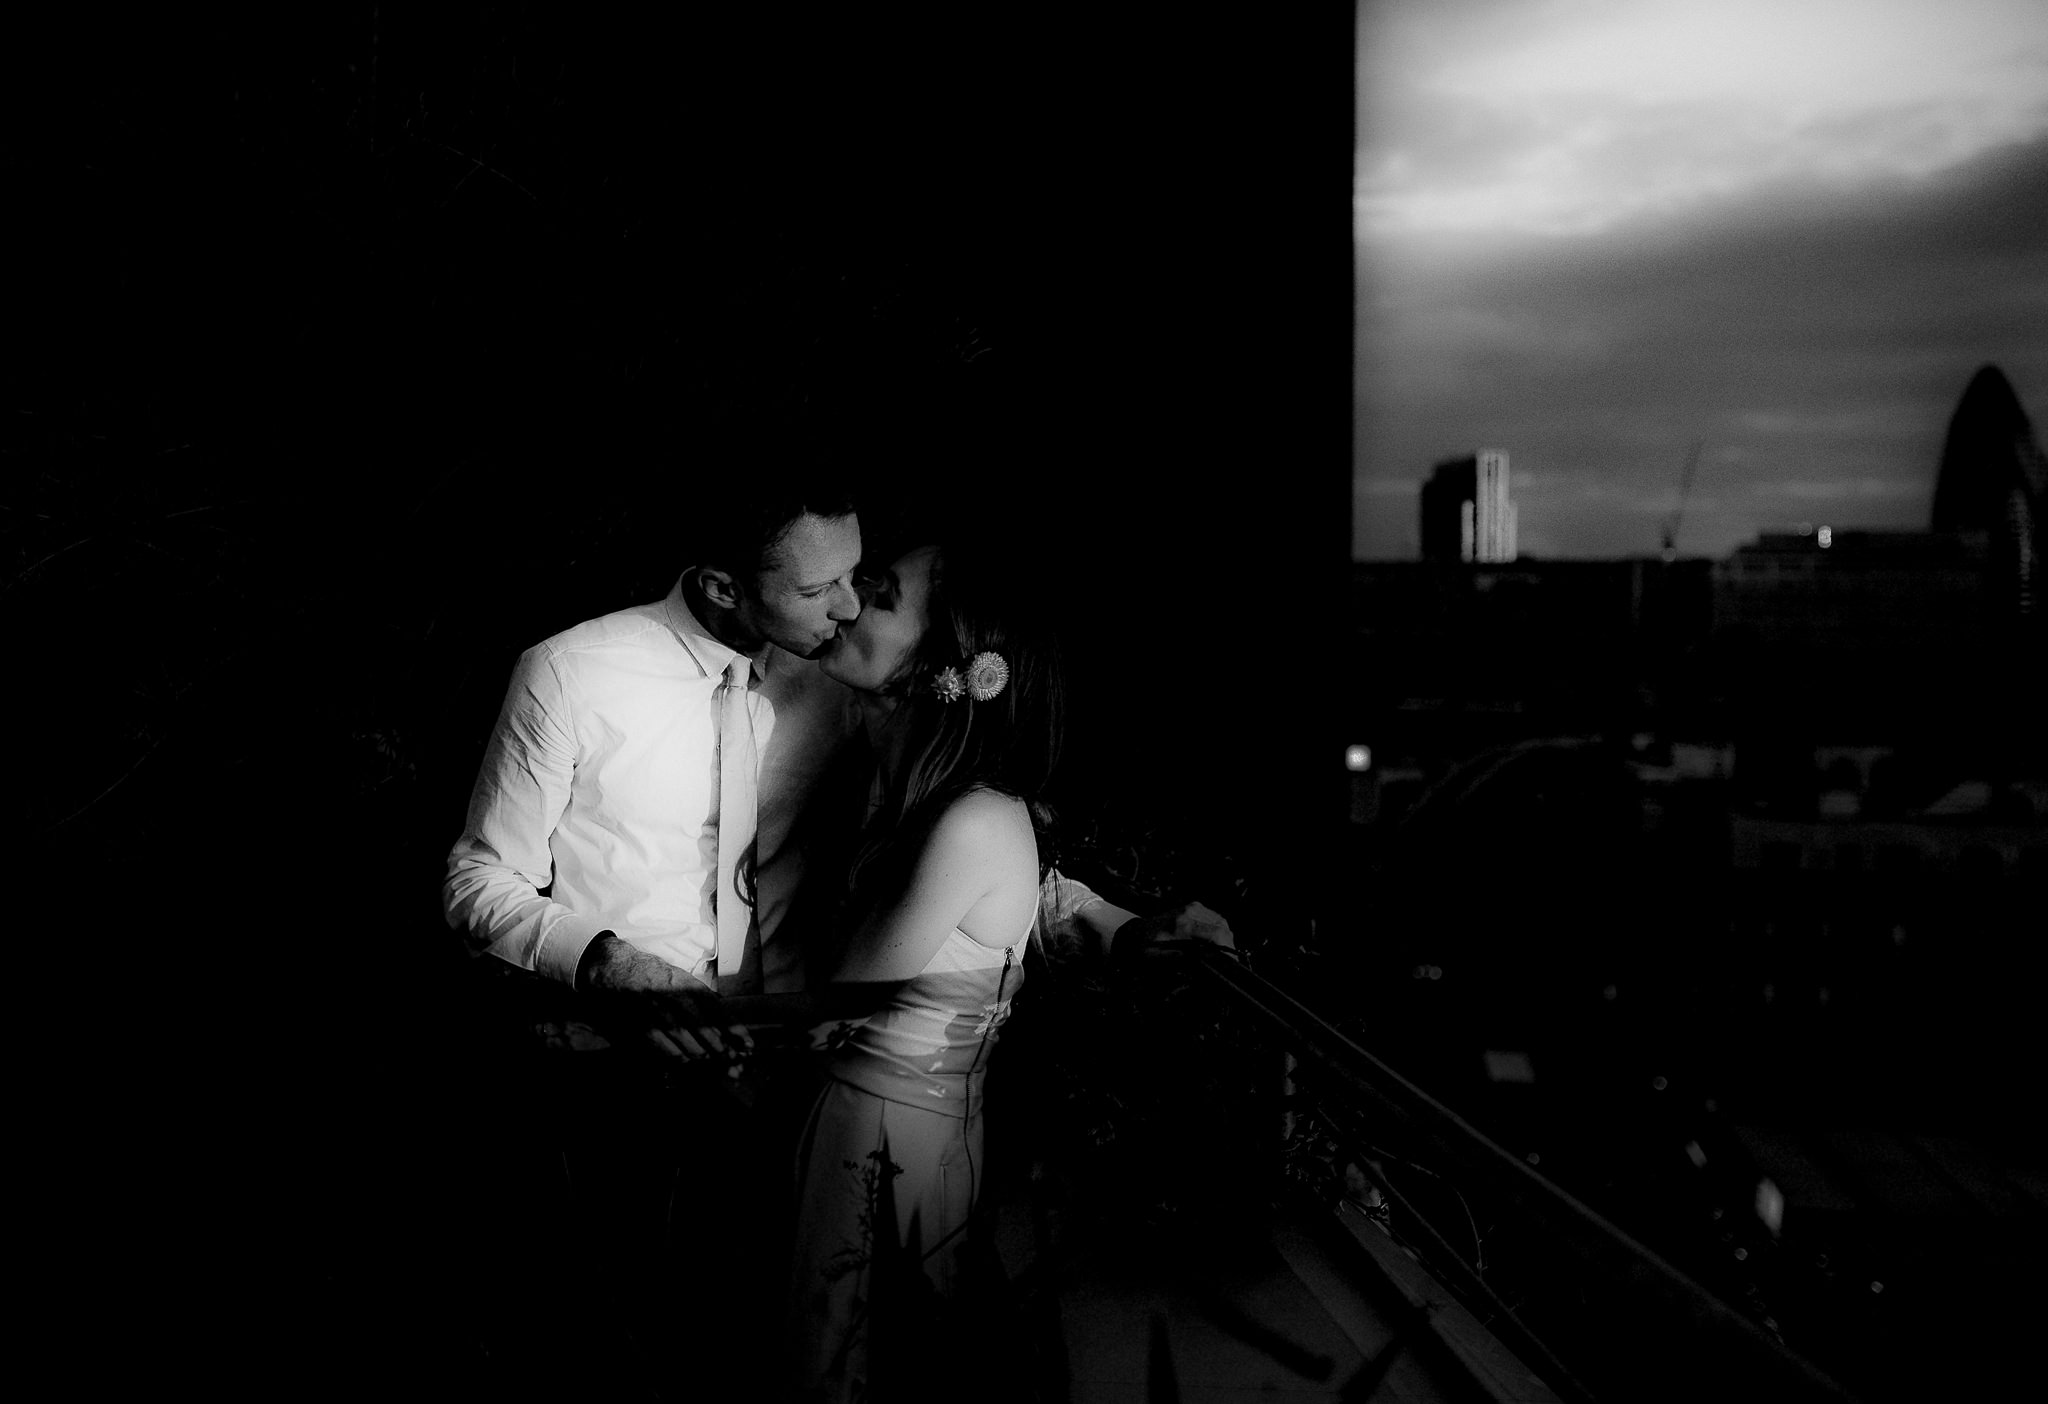 160730 Tom and Natalia2.jpg